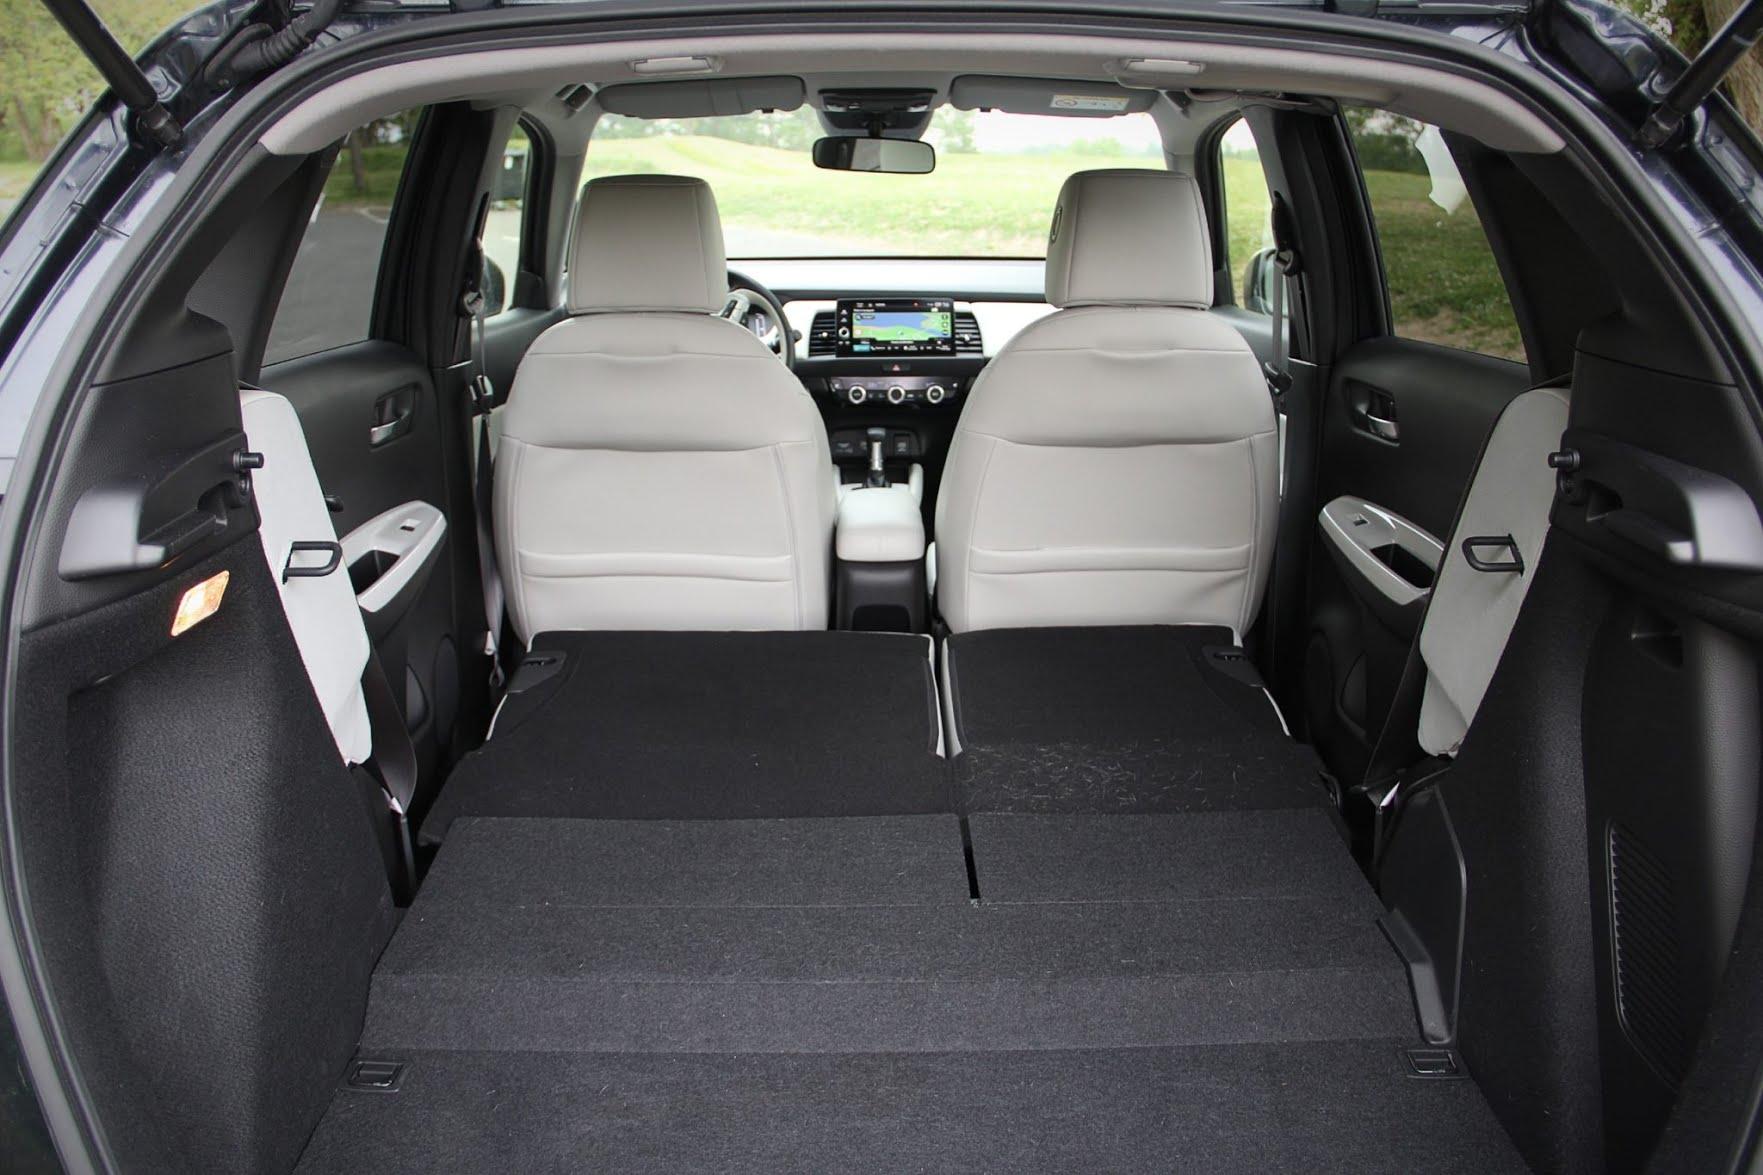 Honda Jazz - coffre avec sièges rabattus